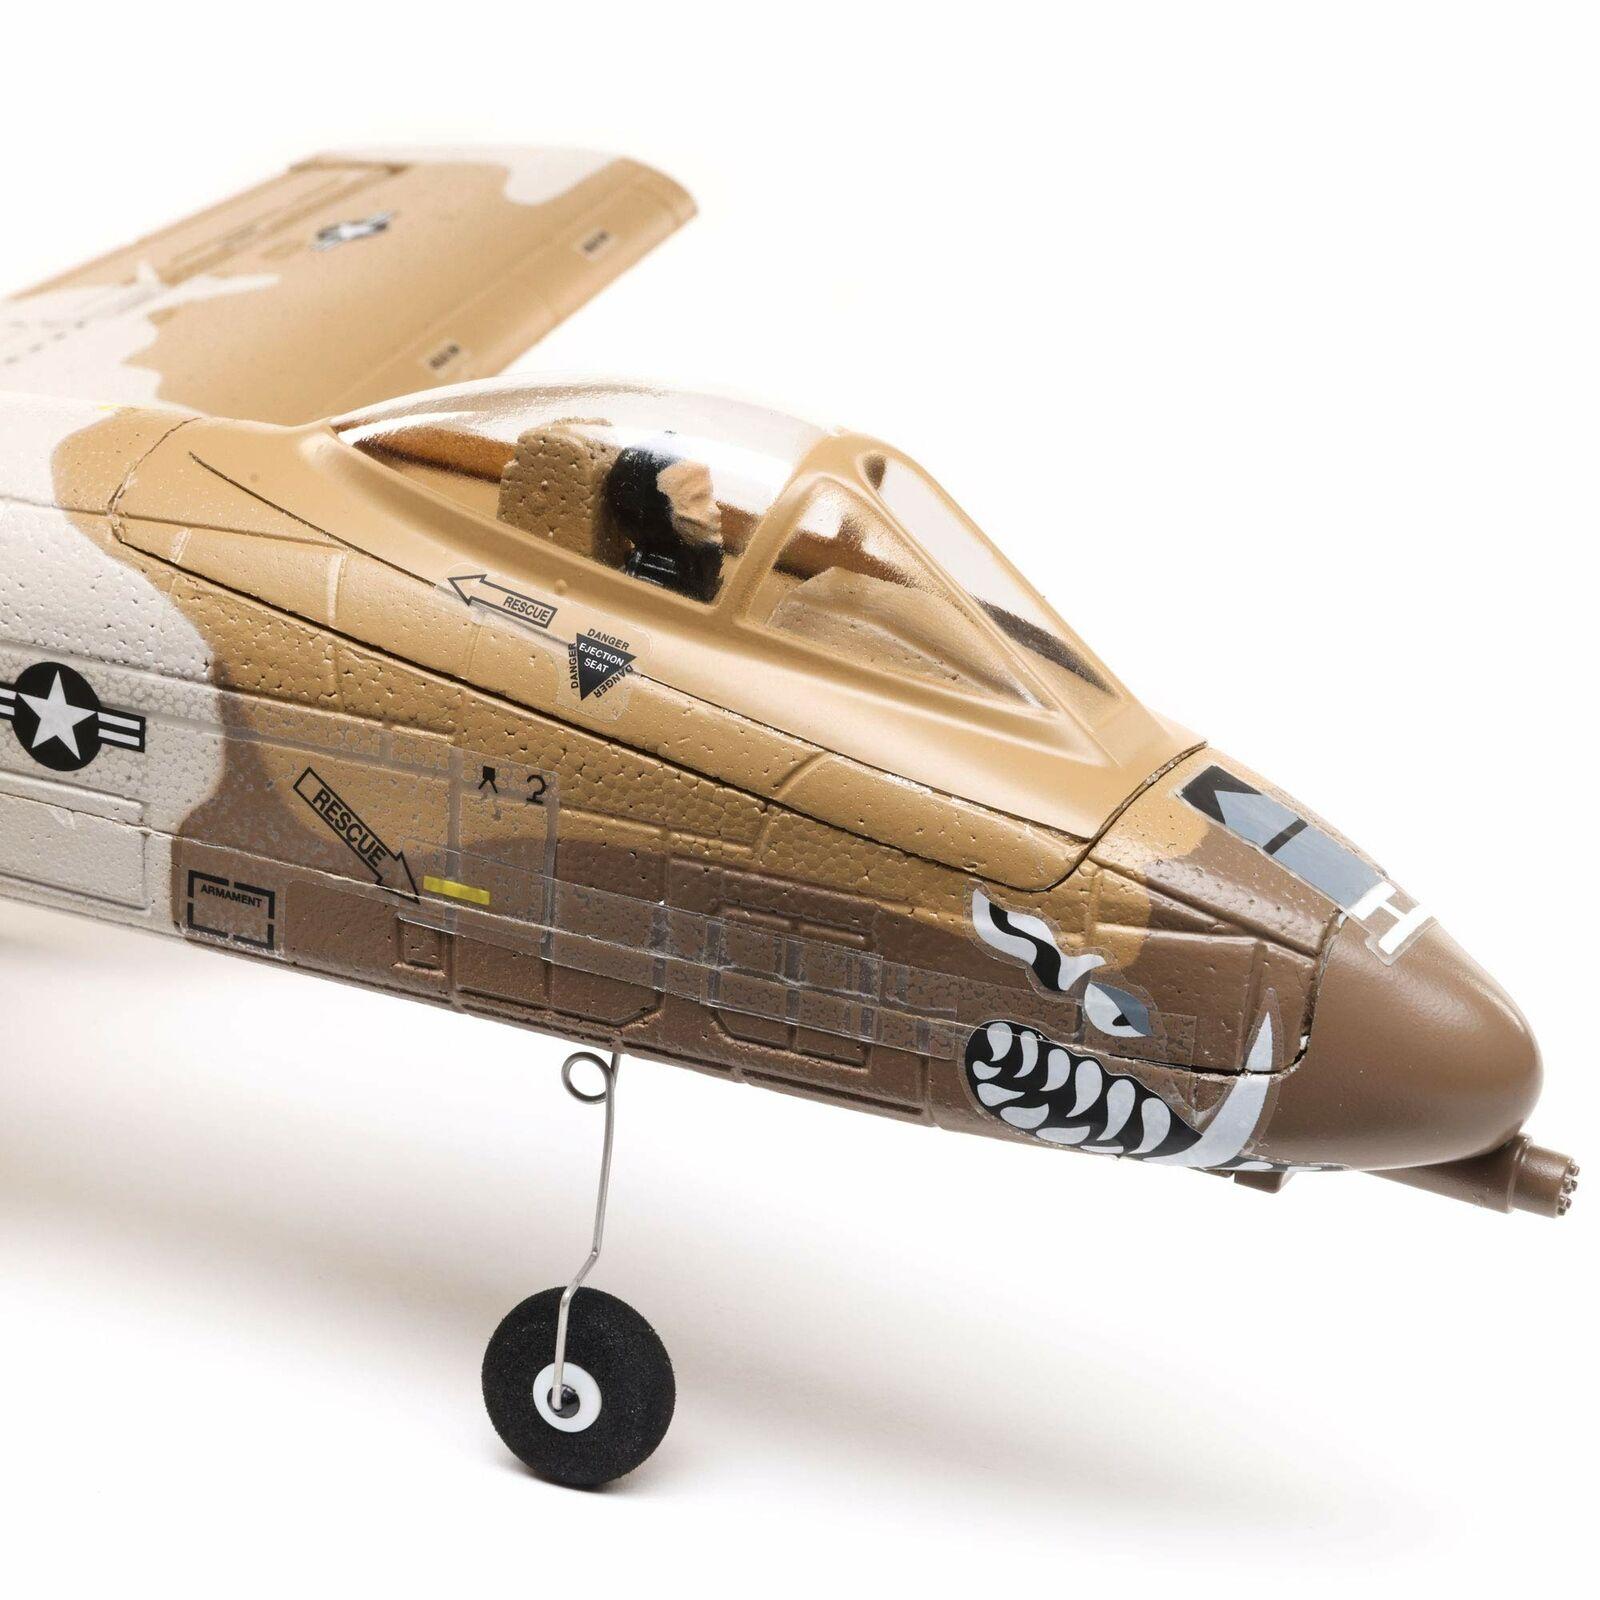 EFLU6554 E-flite Fuselage w//Nacelle Set; UMX A-10 30mm